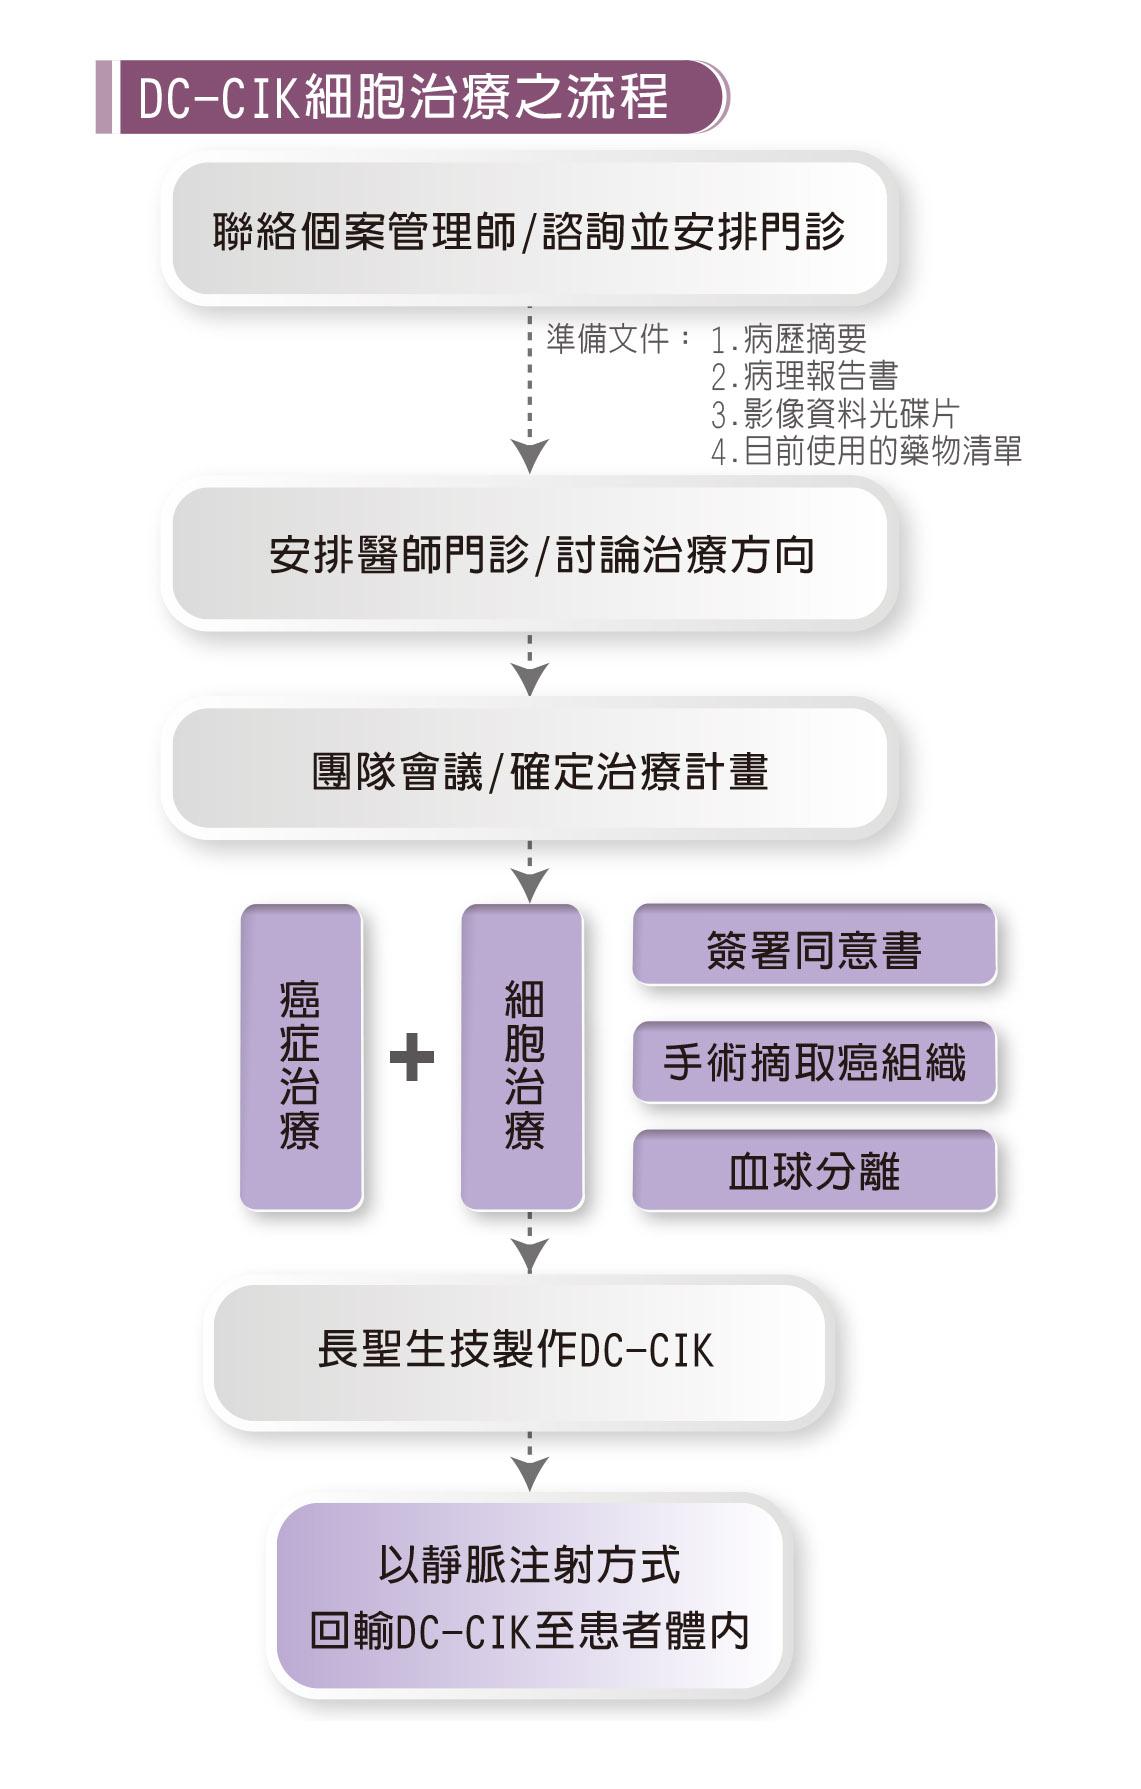 DC-CIK細胞治療之流程